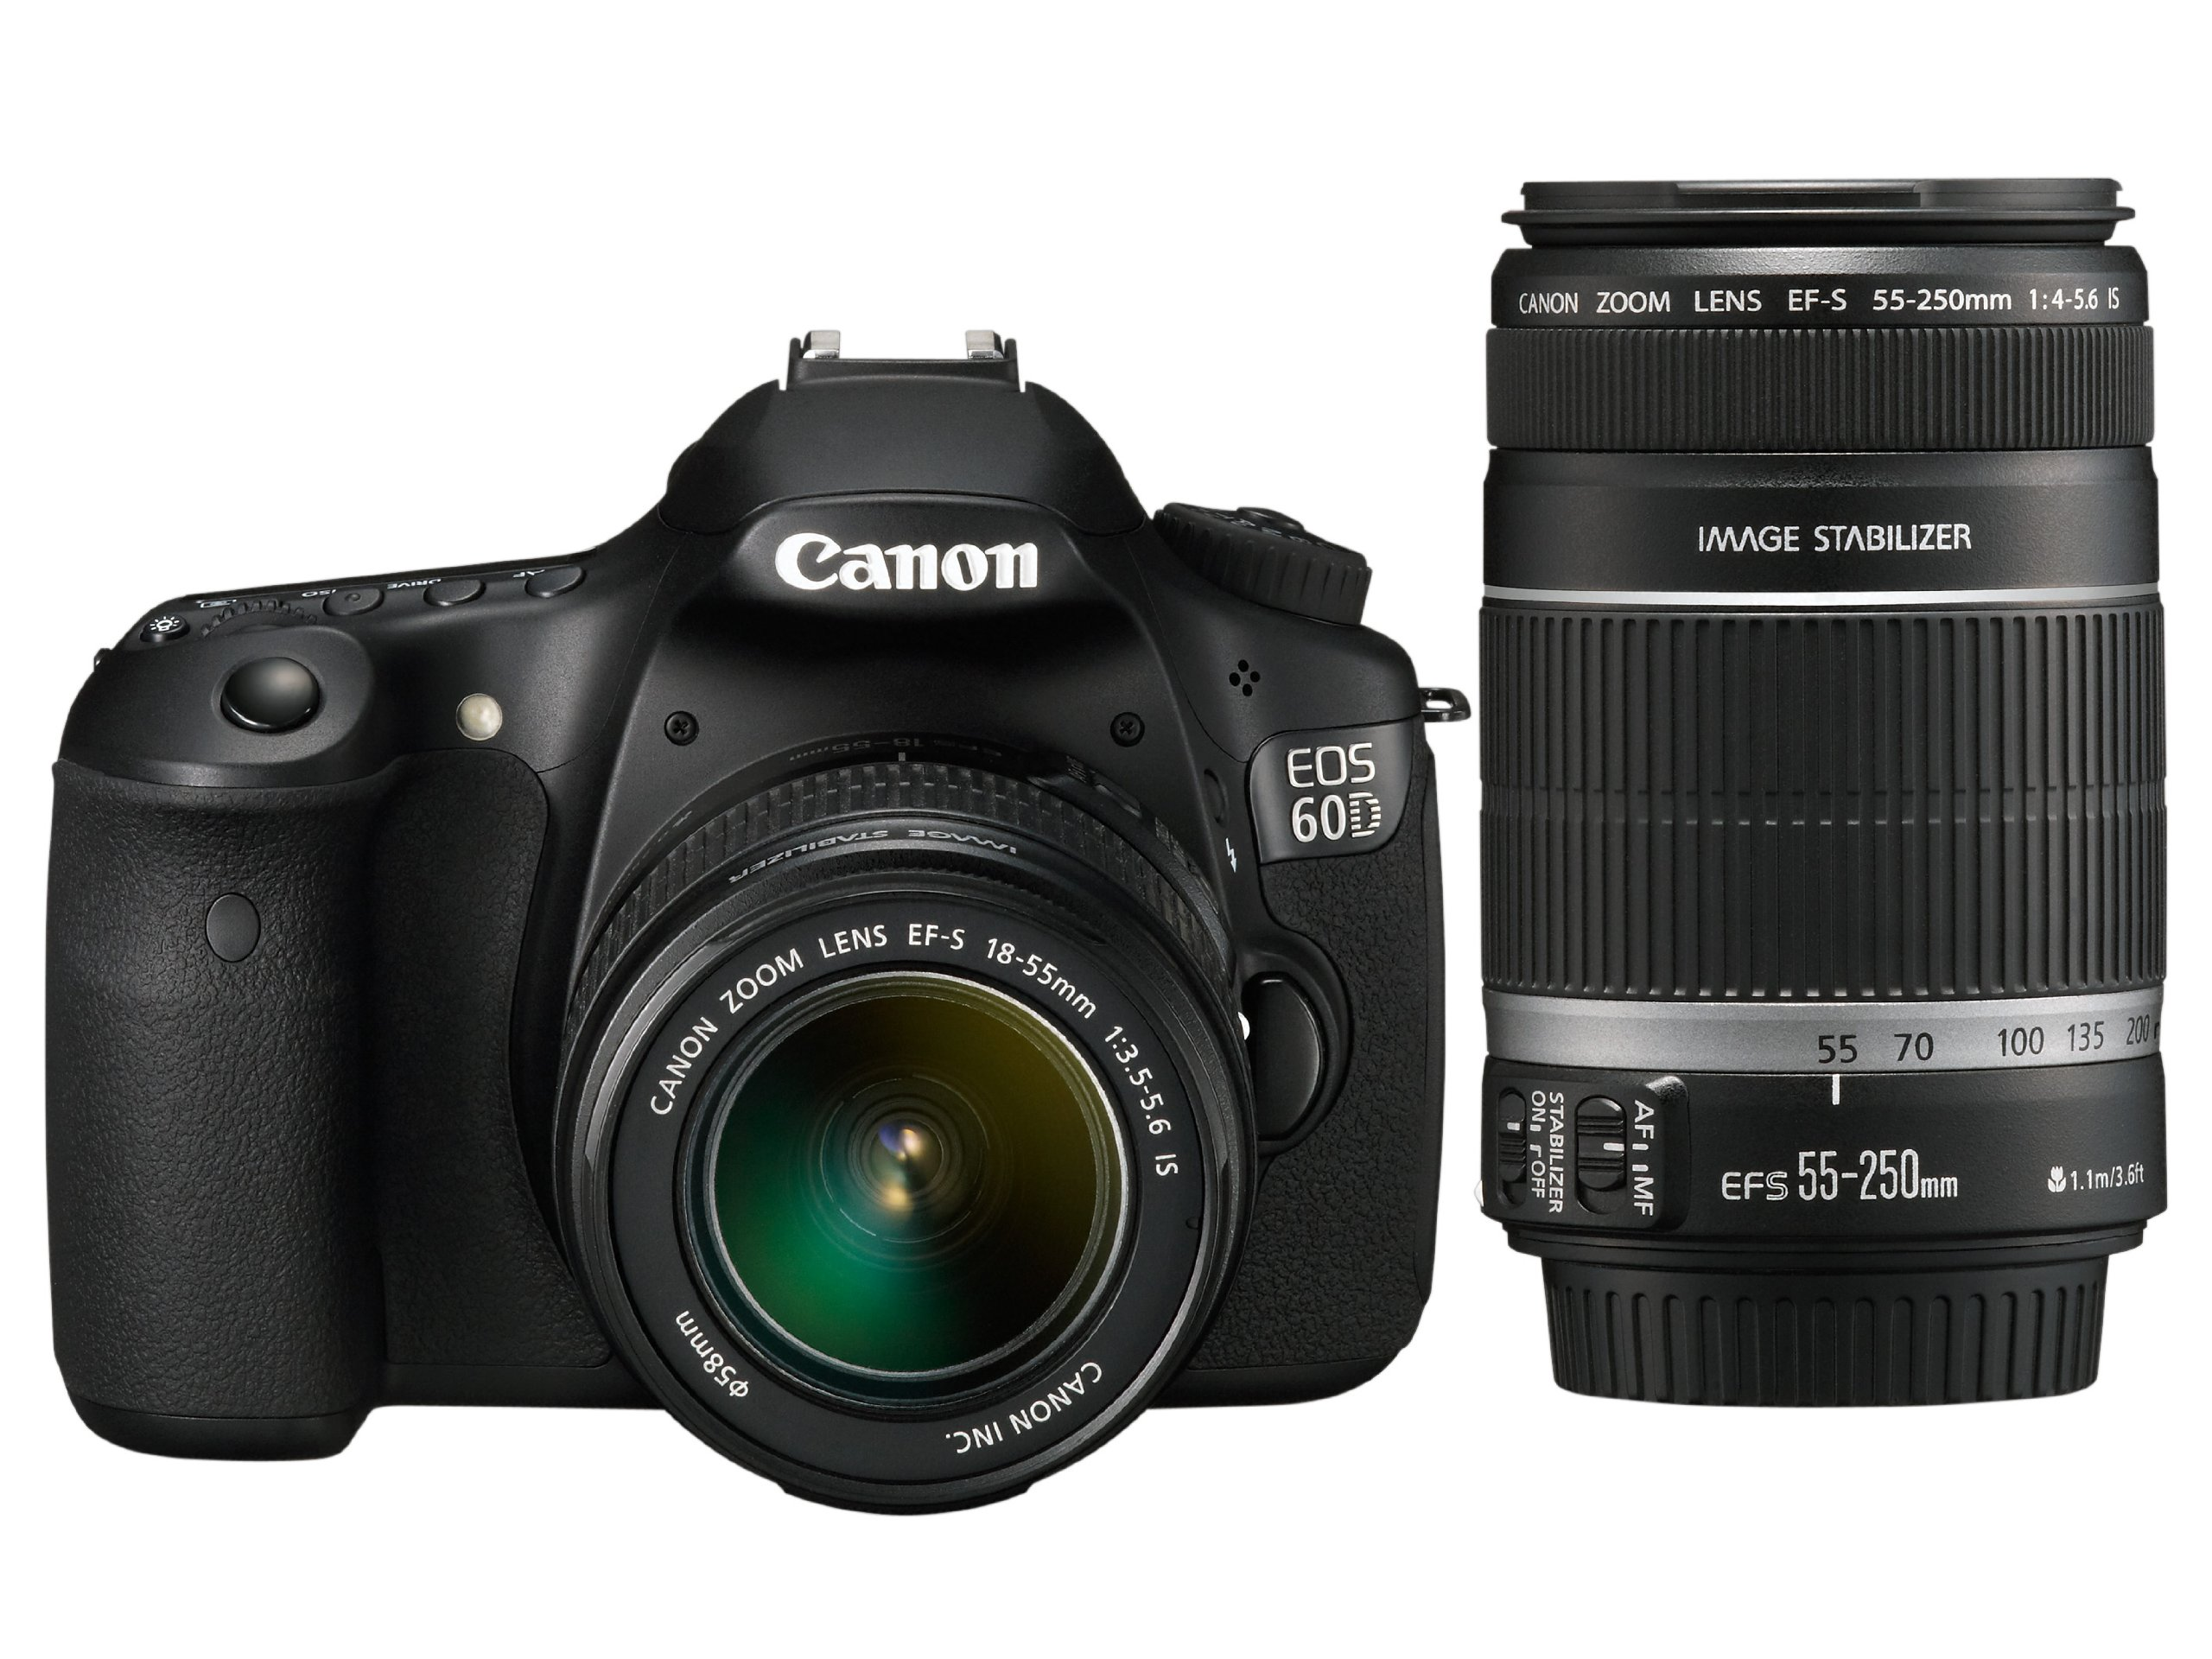 Canon EOS 60D SLR Fotocamera Digitale Reflex 18 Megapixel + Kit EF-S 18-55mm IS e EF-S 55-250mm IS product image